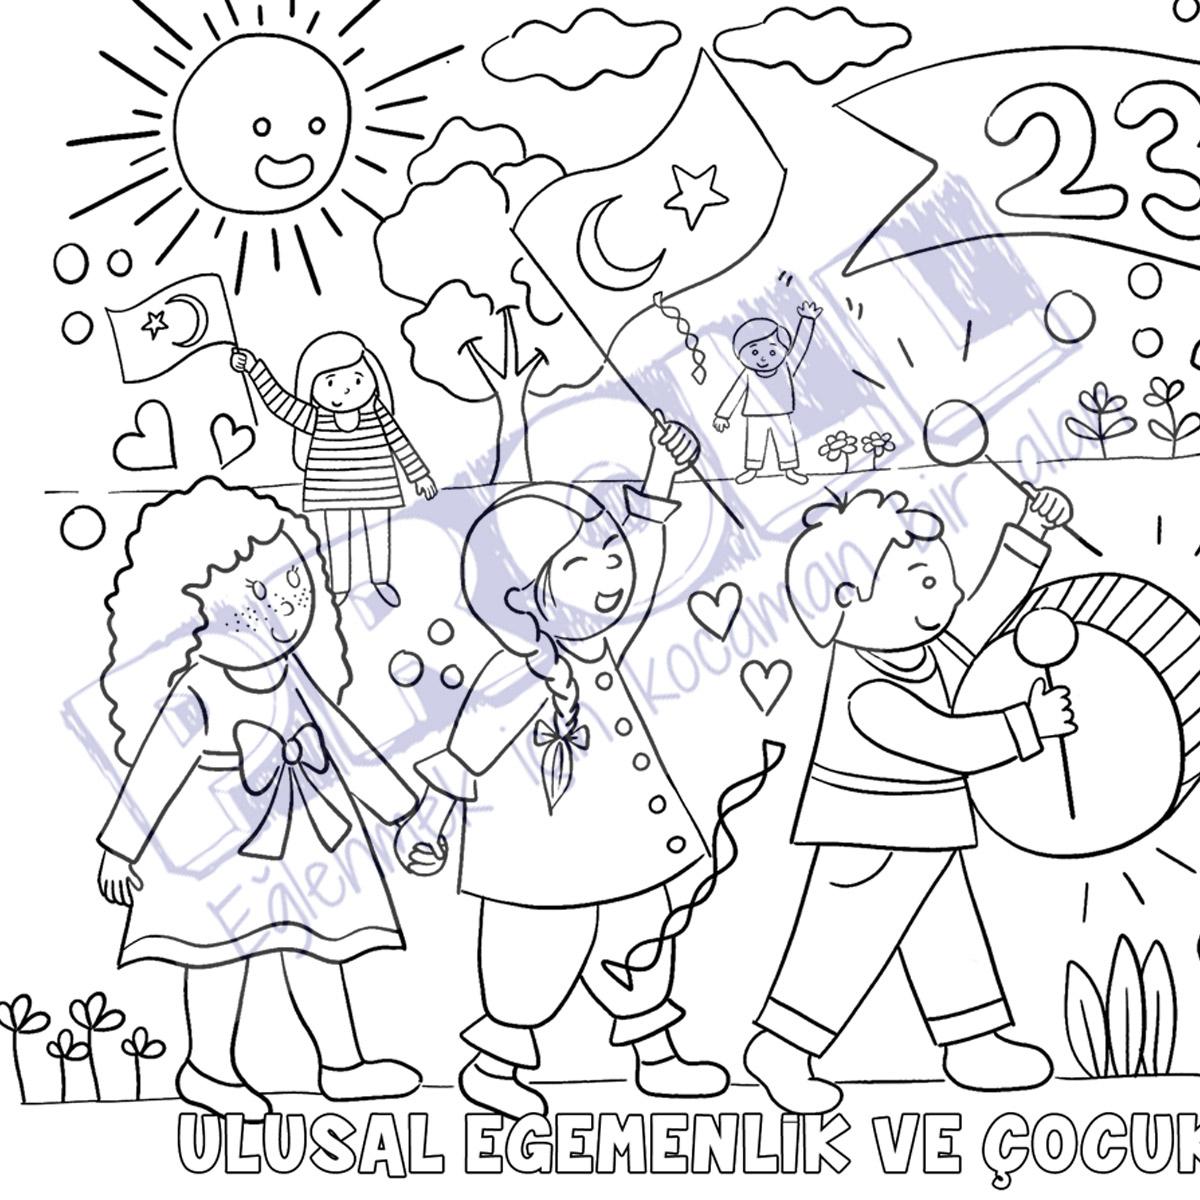 23 Nisan Boyama Kagidi Proll Dev Boyama Kagitlari